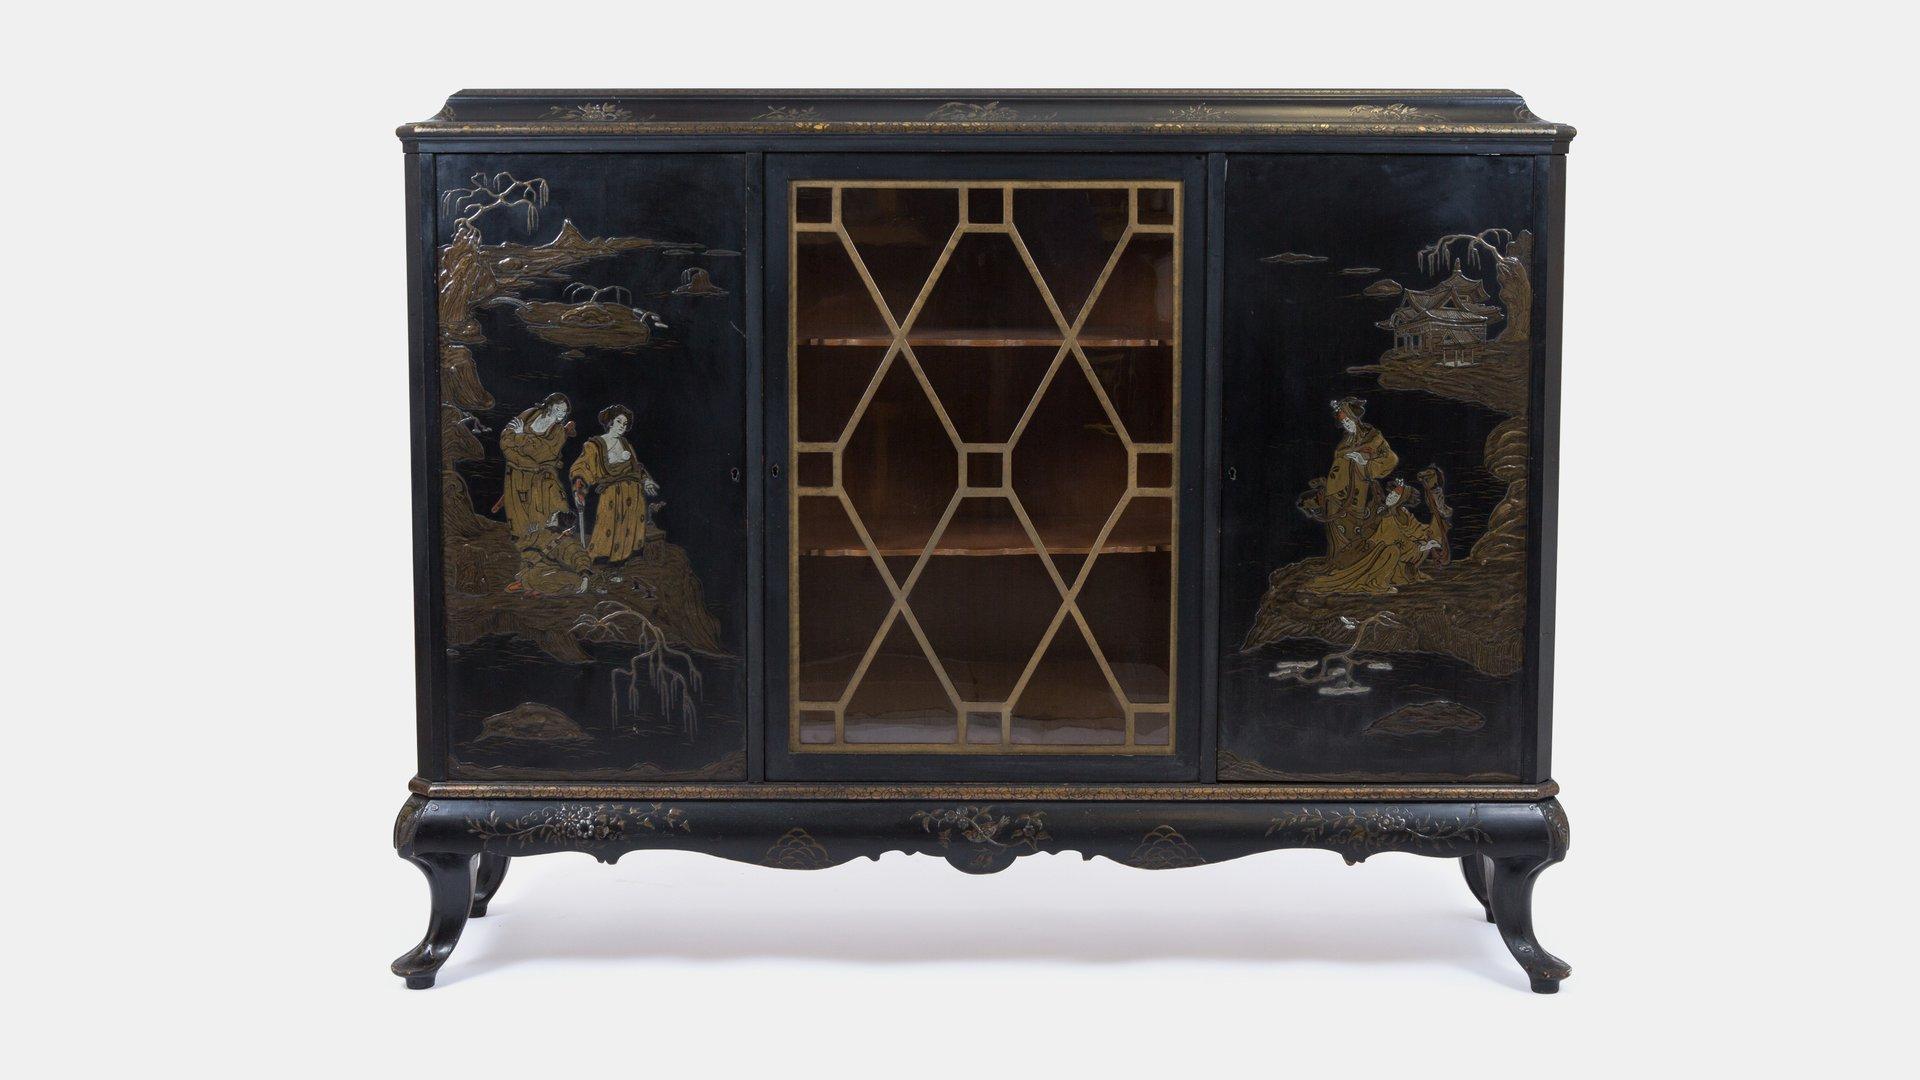 Antique Metal Dental Cabinet Antique Cabinets Online Shop Shop Antique Cabinets At Pamono